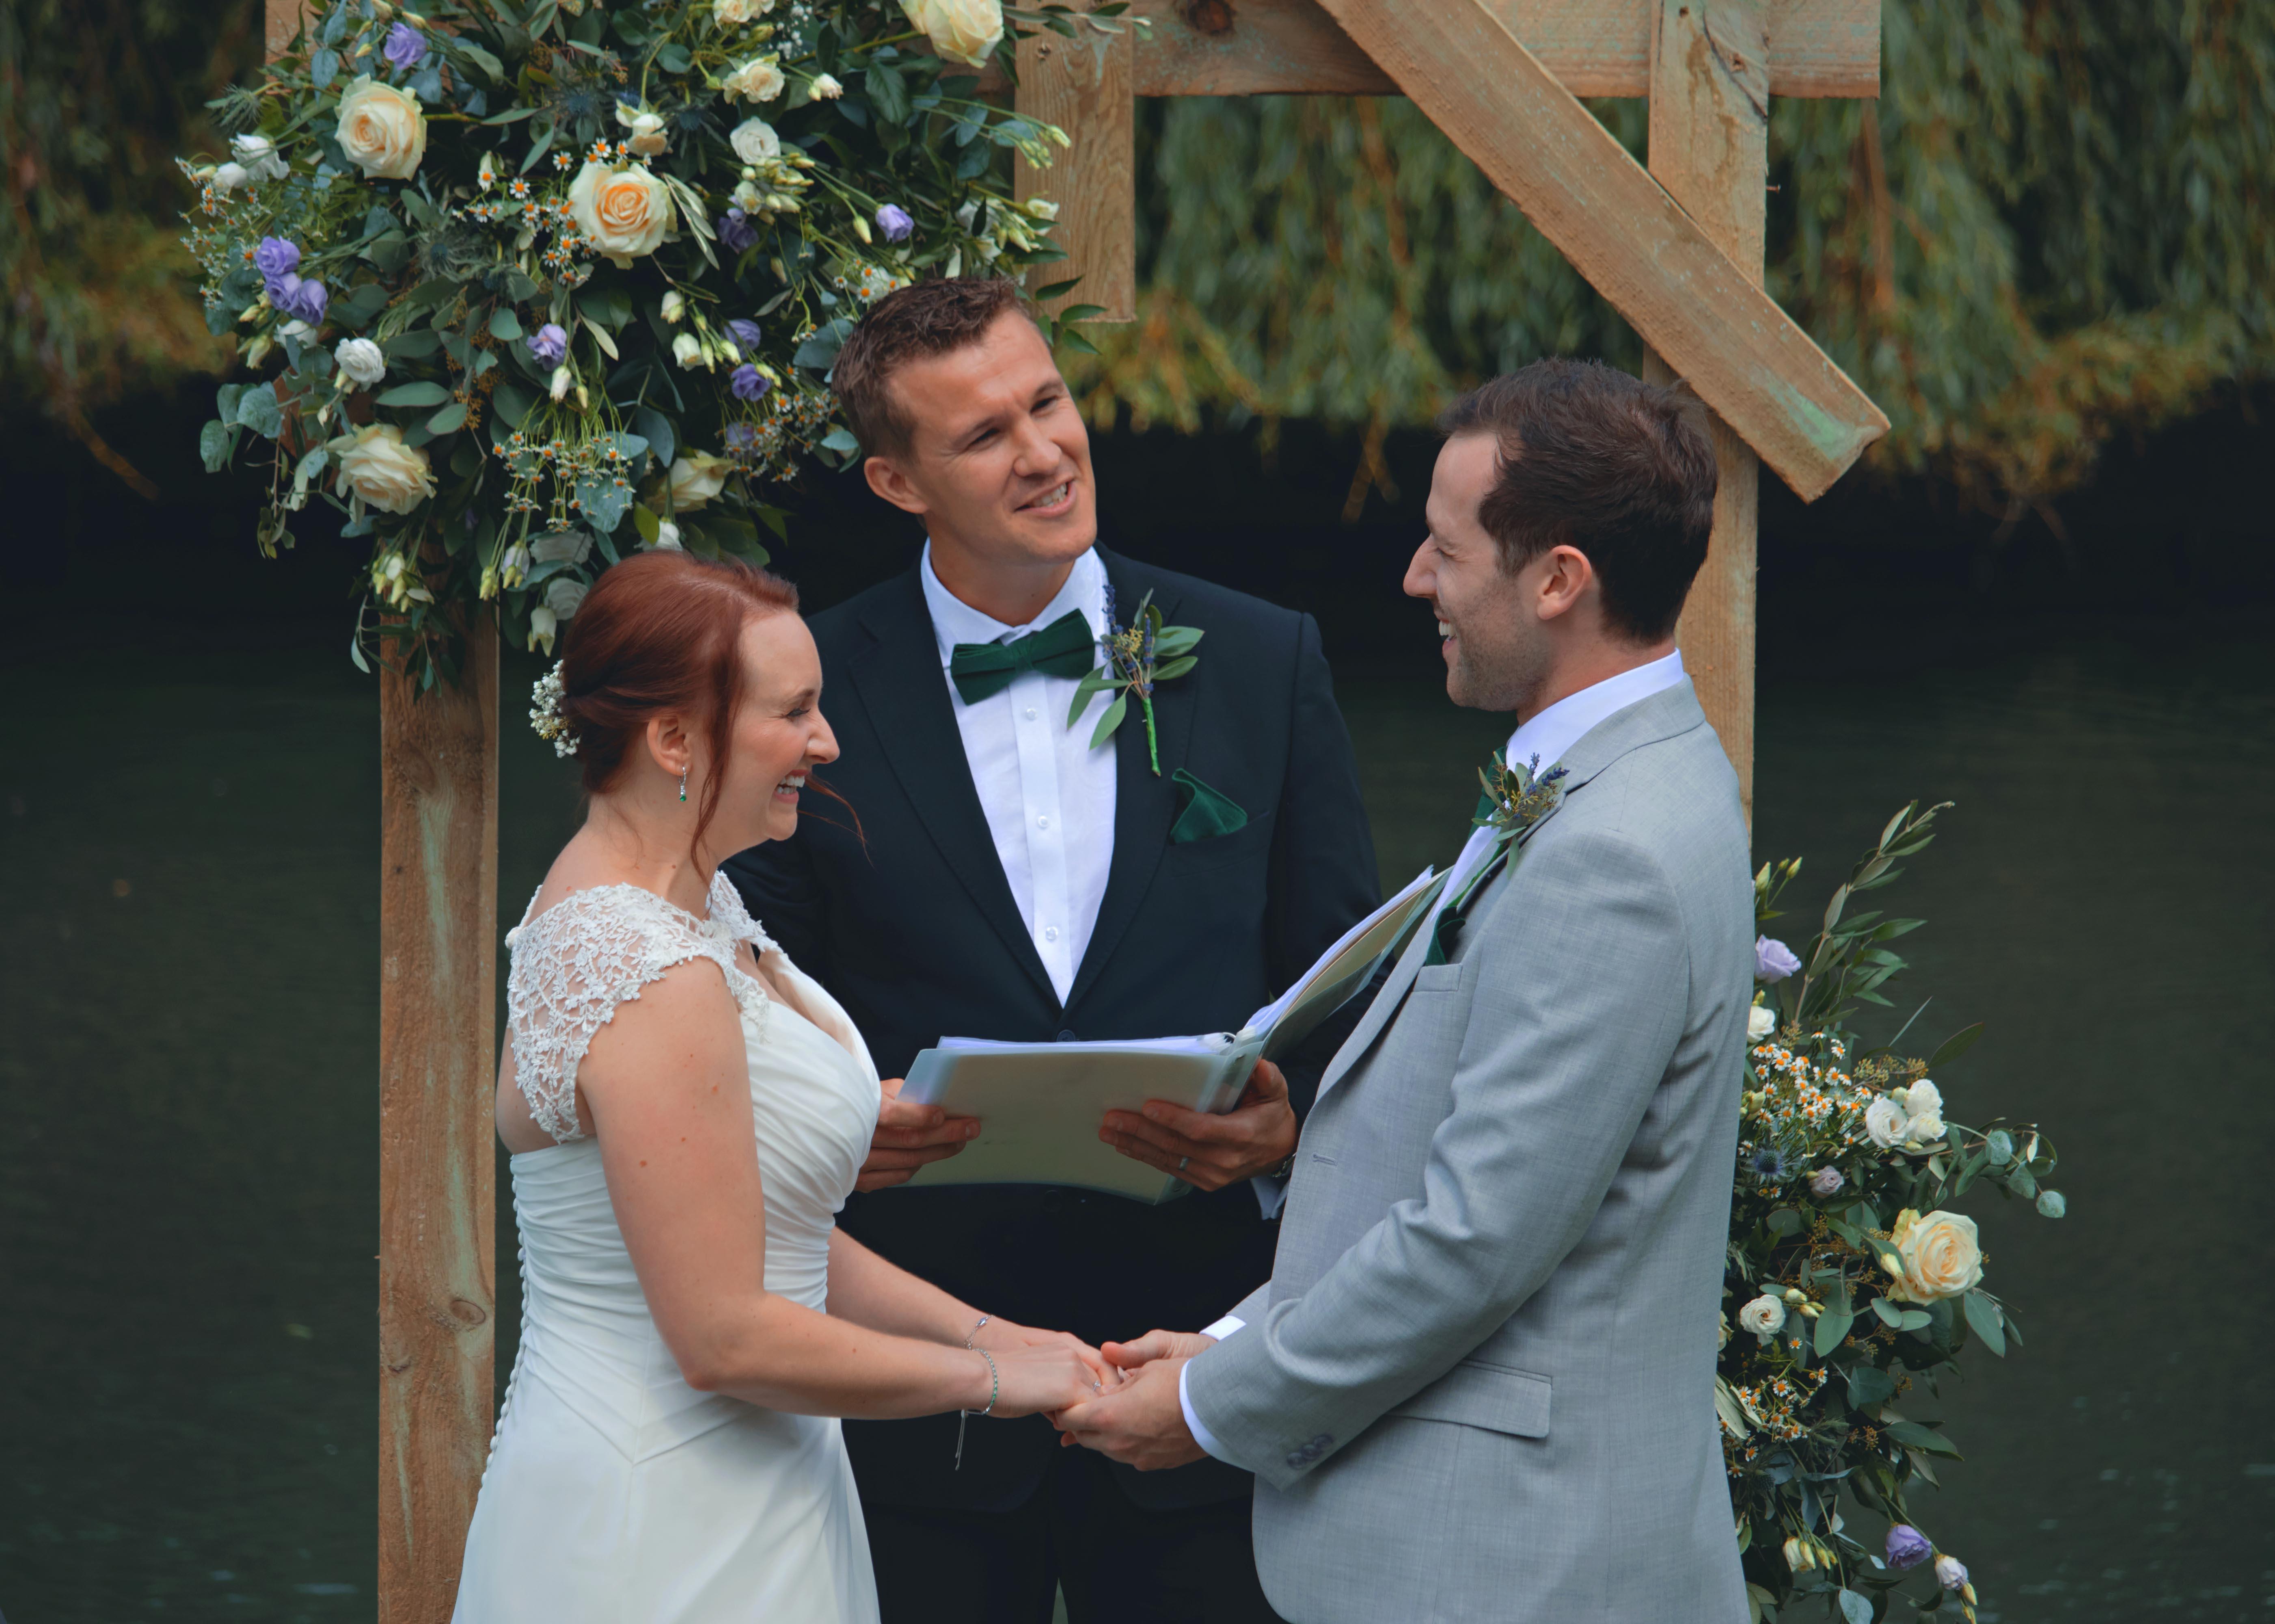 Humanist Wedding Ceremony in Surrey